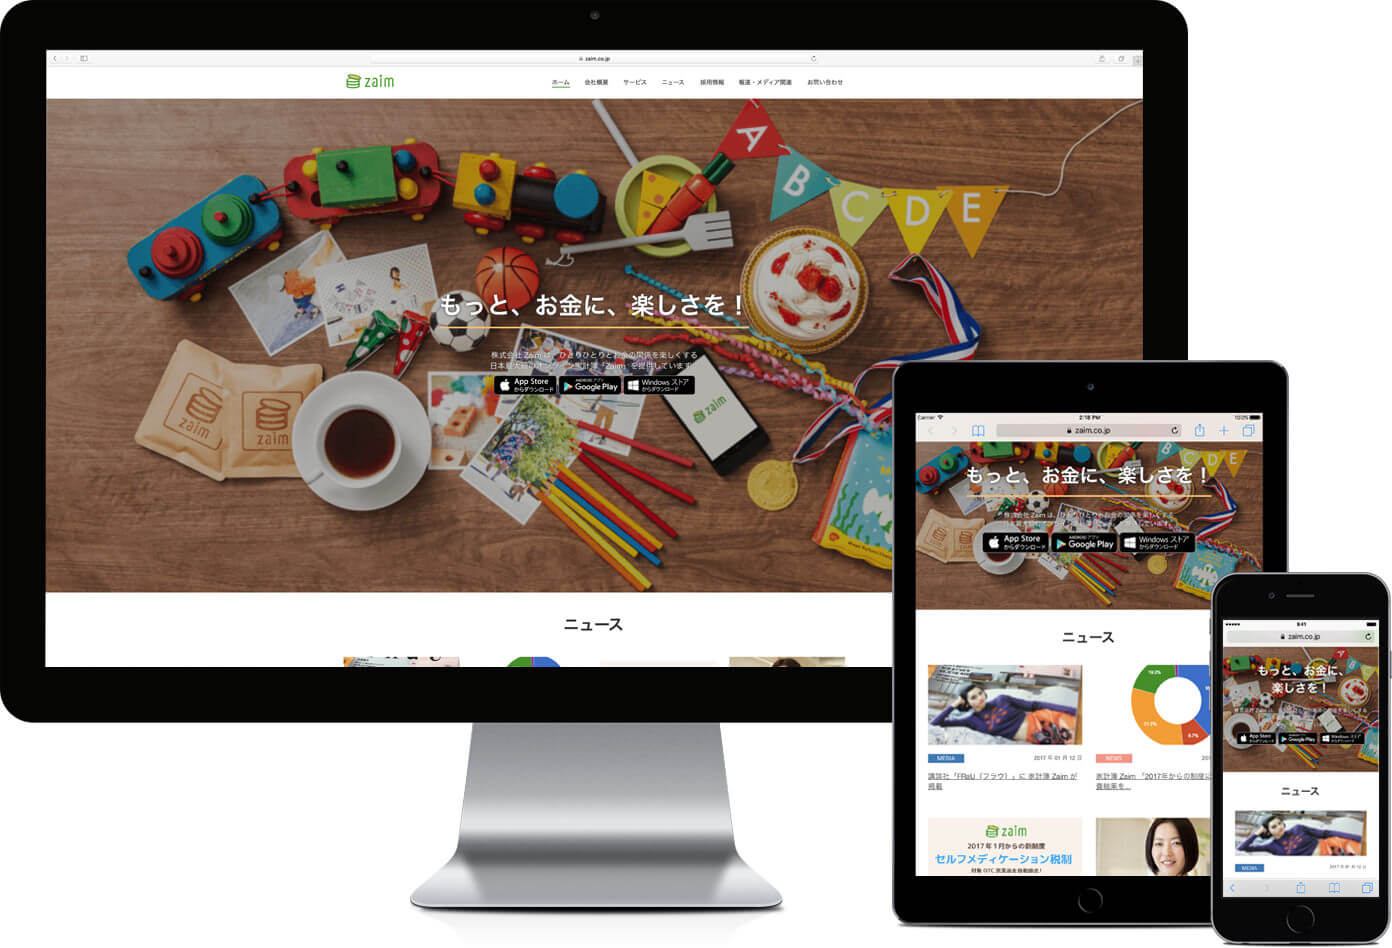 zaim_Corporate_website_renewal